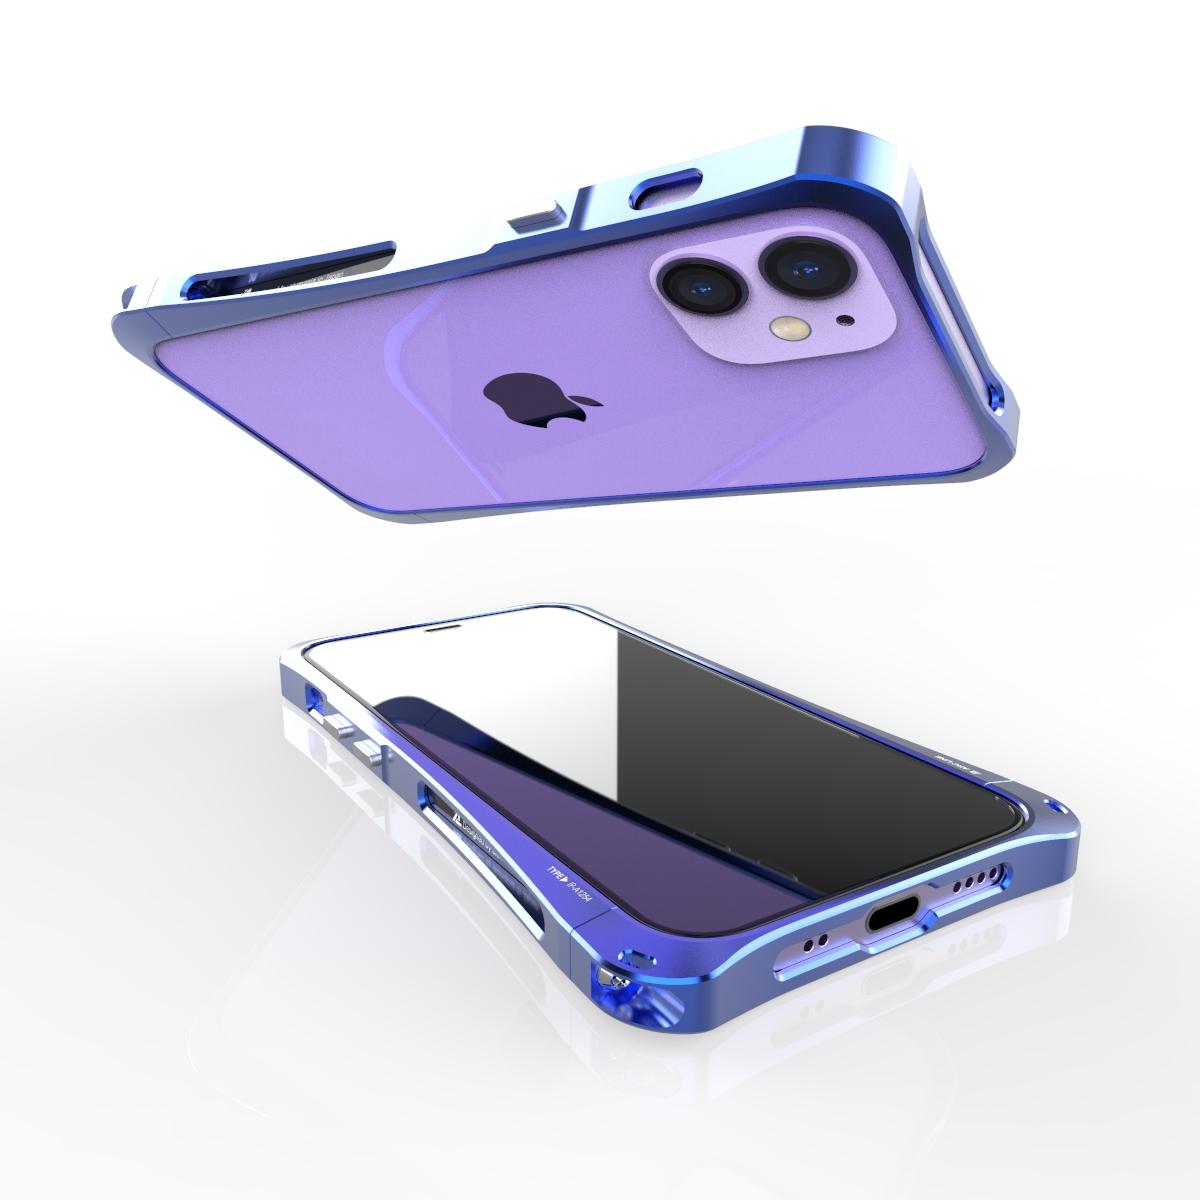 iPhone12miniとiPhone12に新色パープルが追加されます